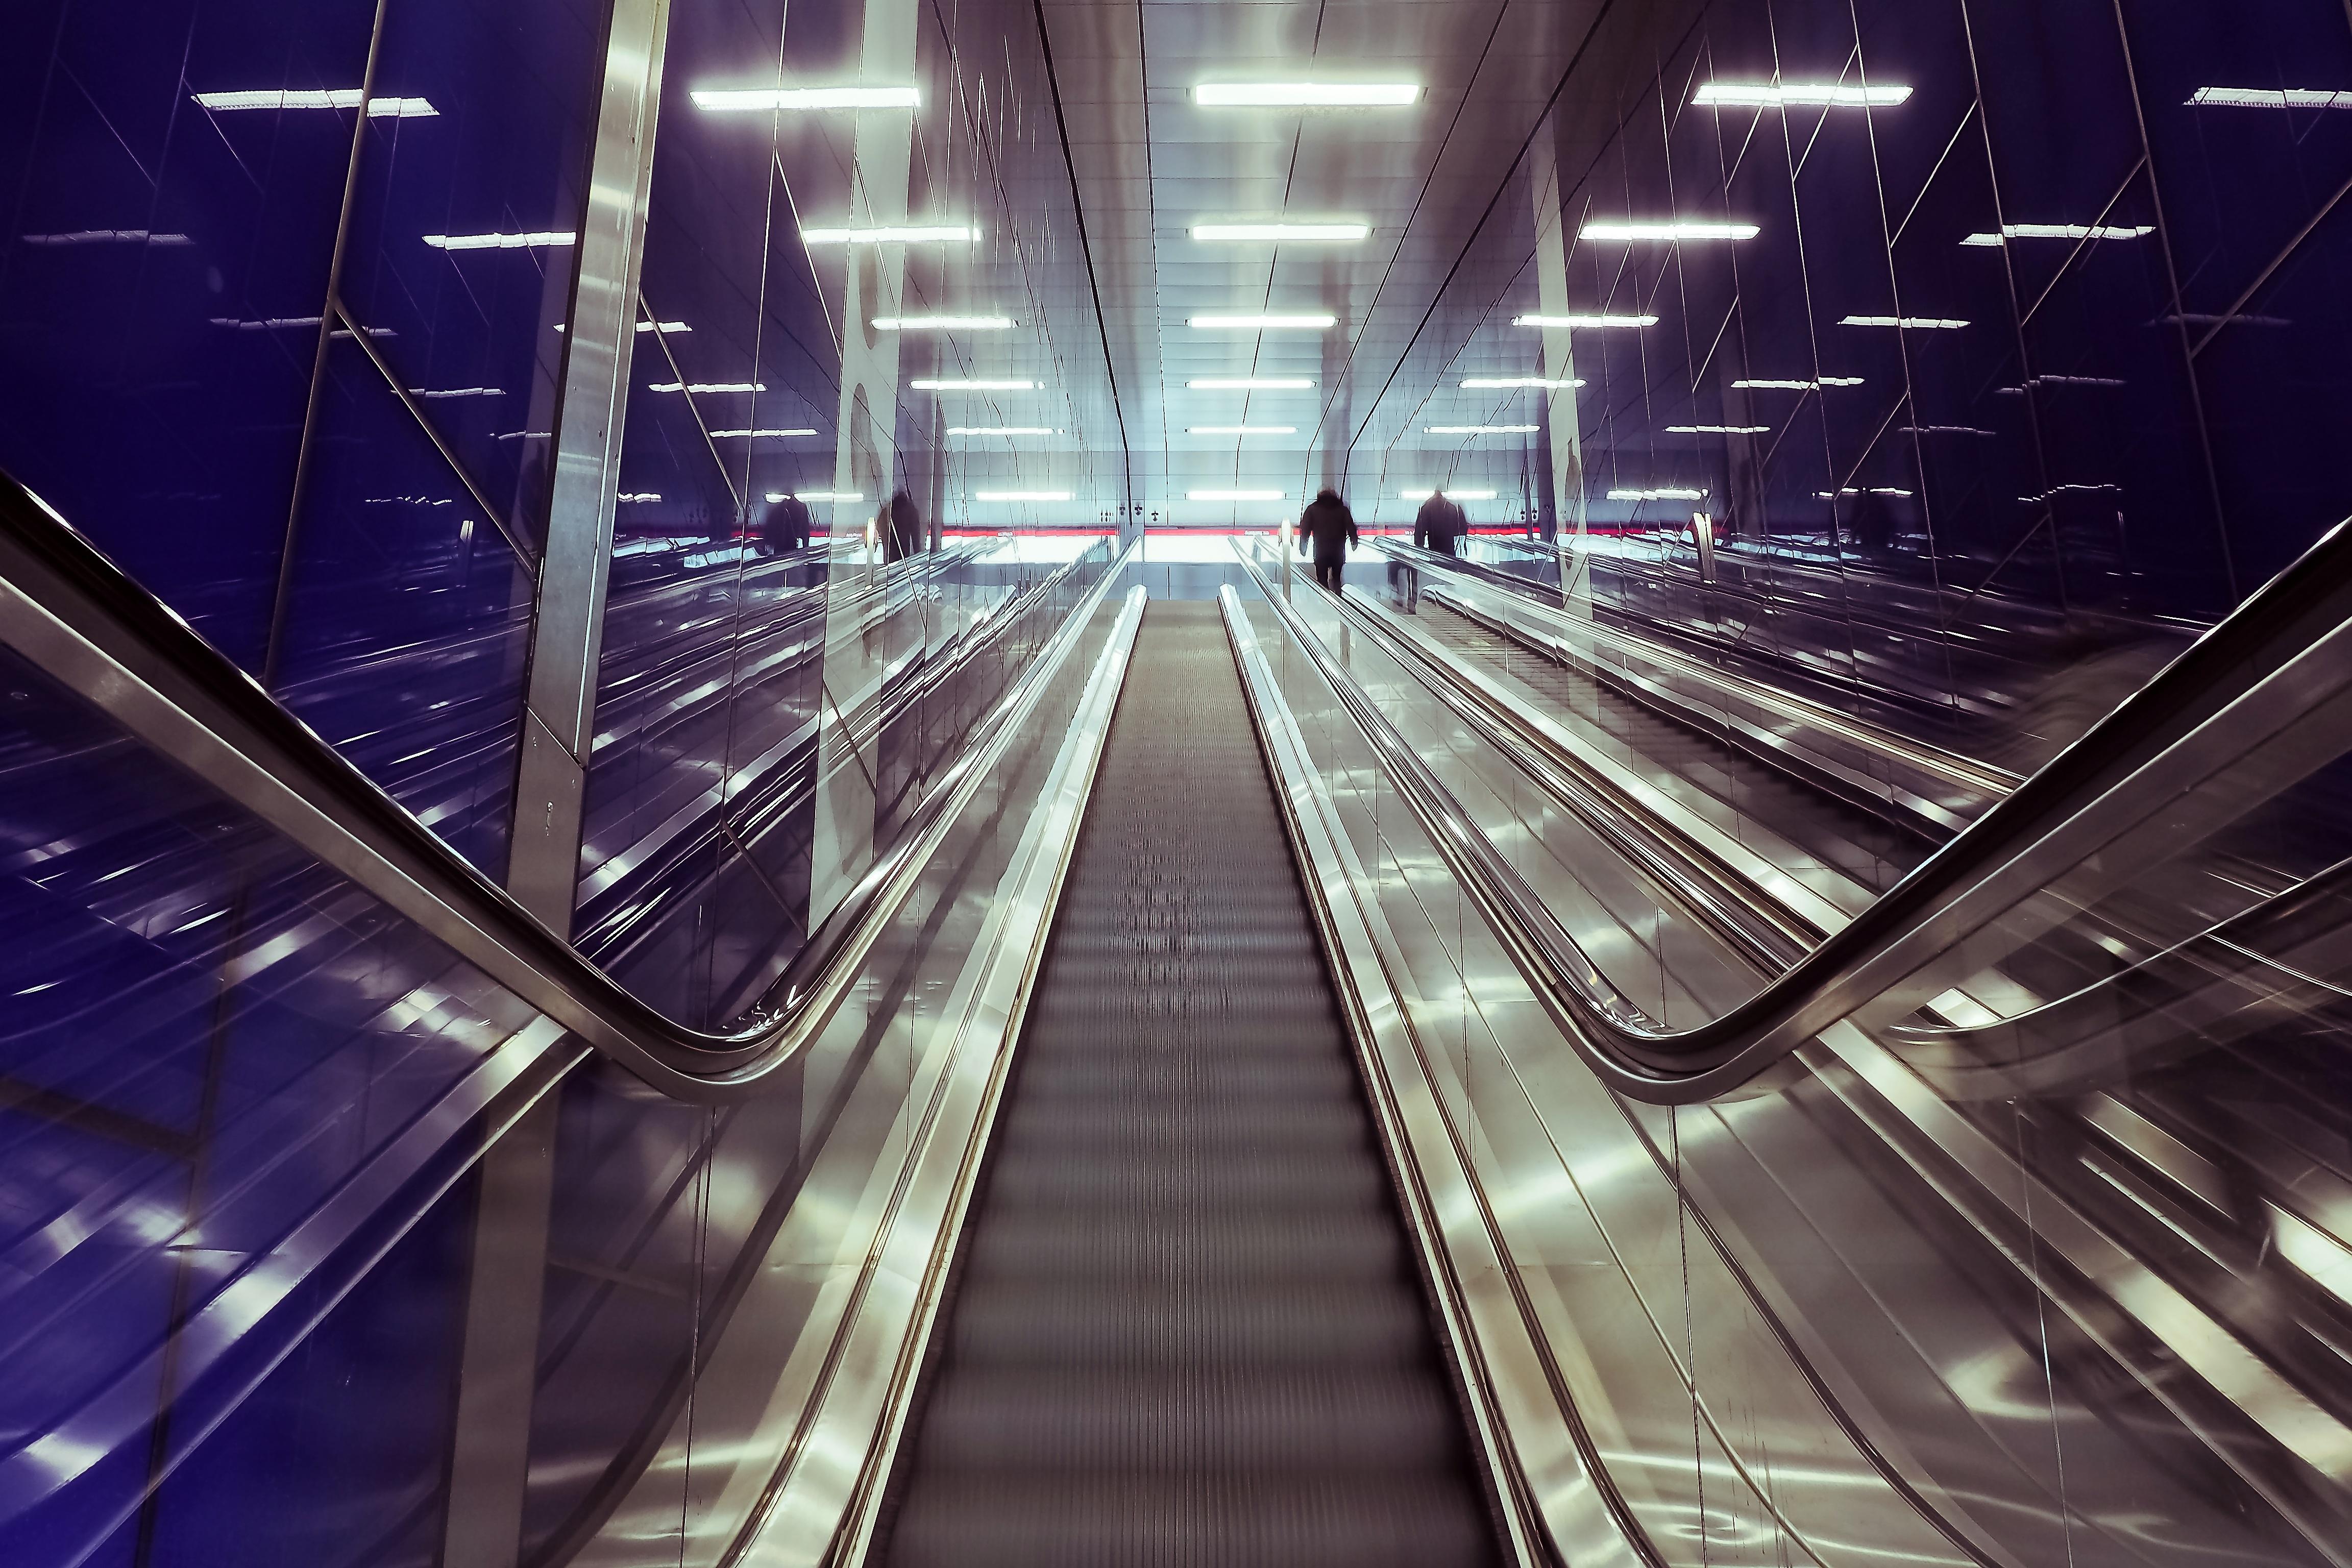 Free Images Light Architecture Urban Escalator Subway Underground Construction Line Metal Darkness Blue Modern Metro Station Trainstation